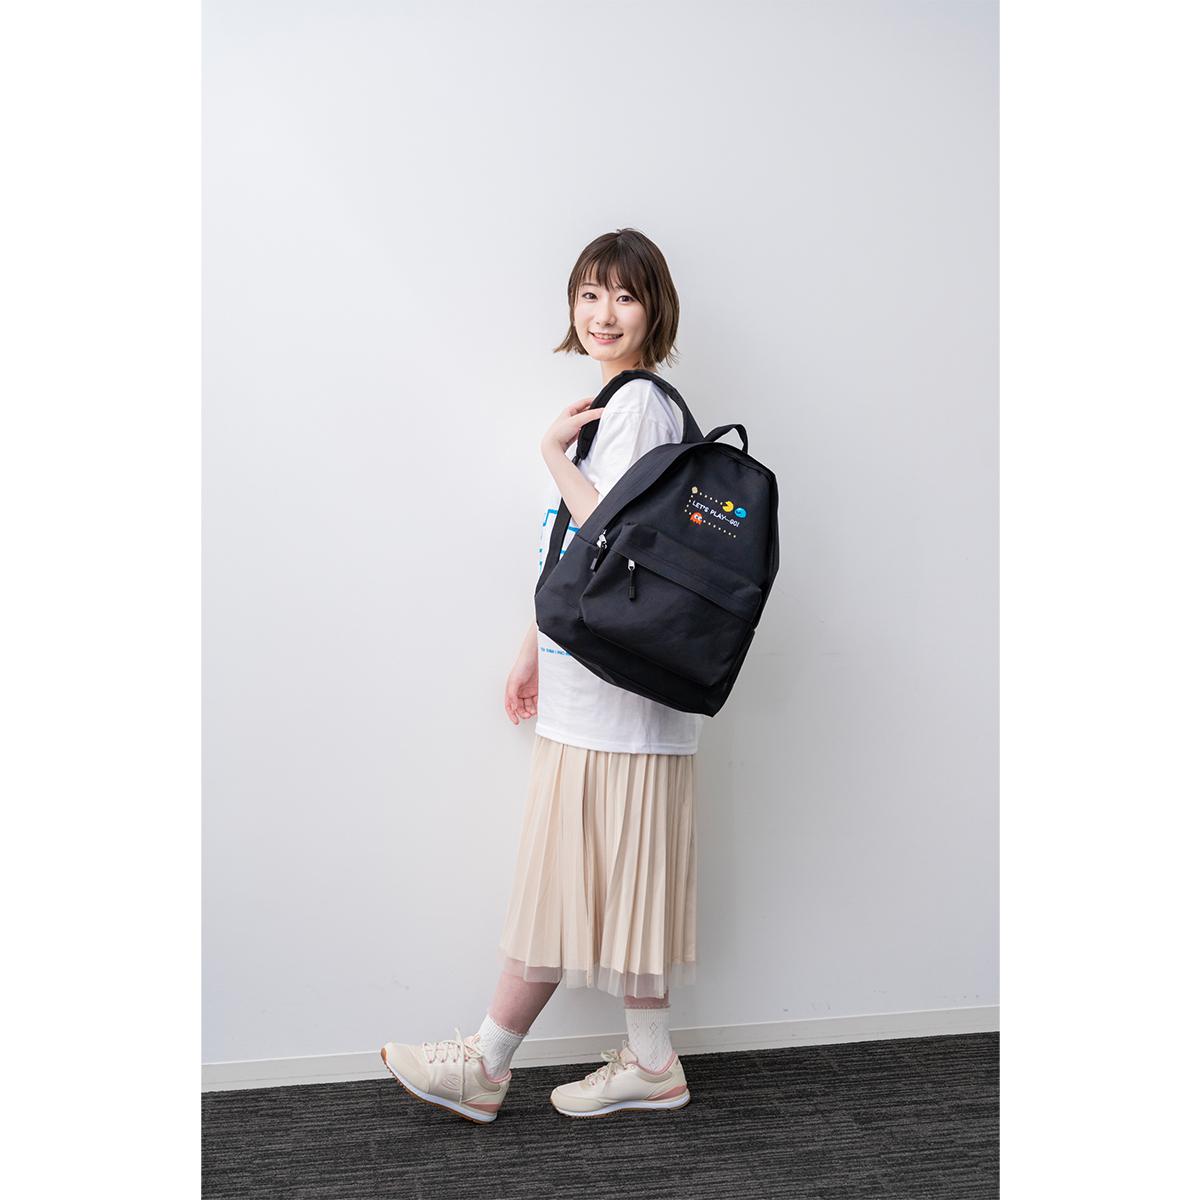 TEN-SURA x PAC-MAN™ Collaboration Backpack